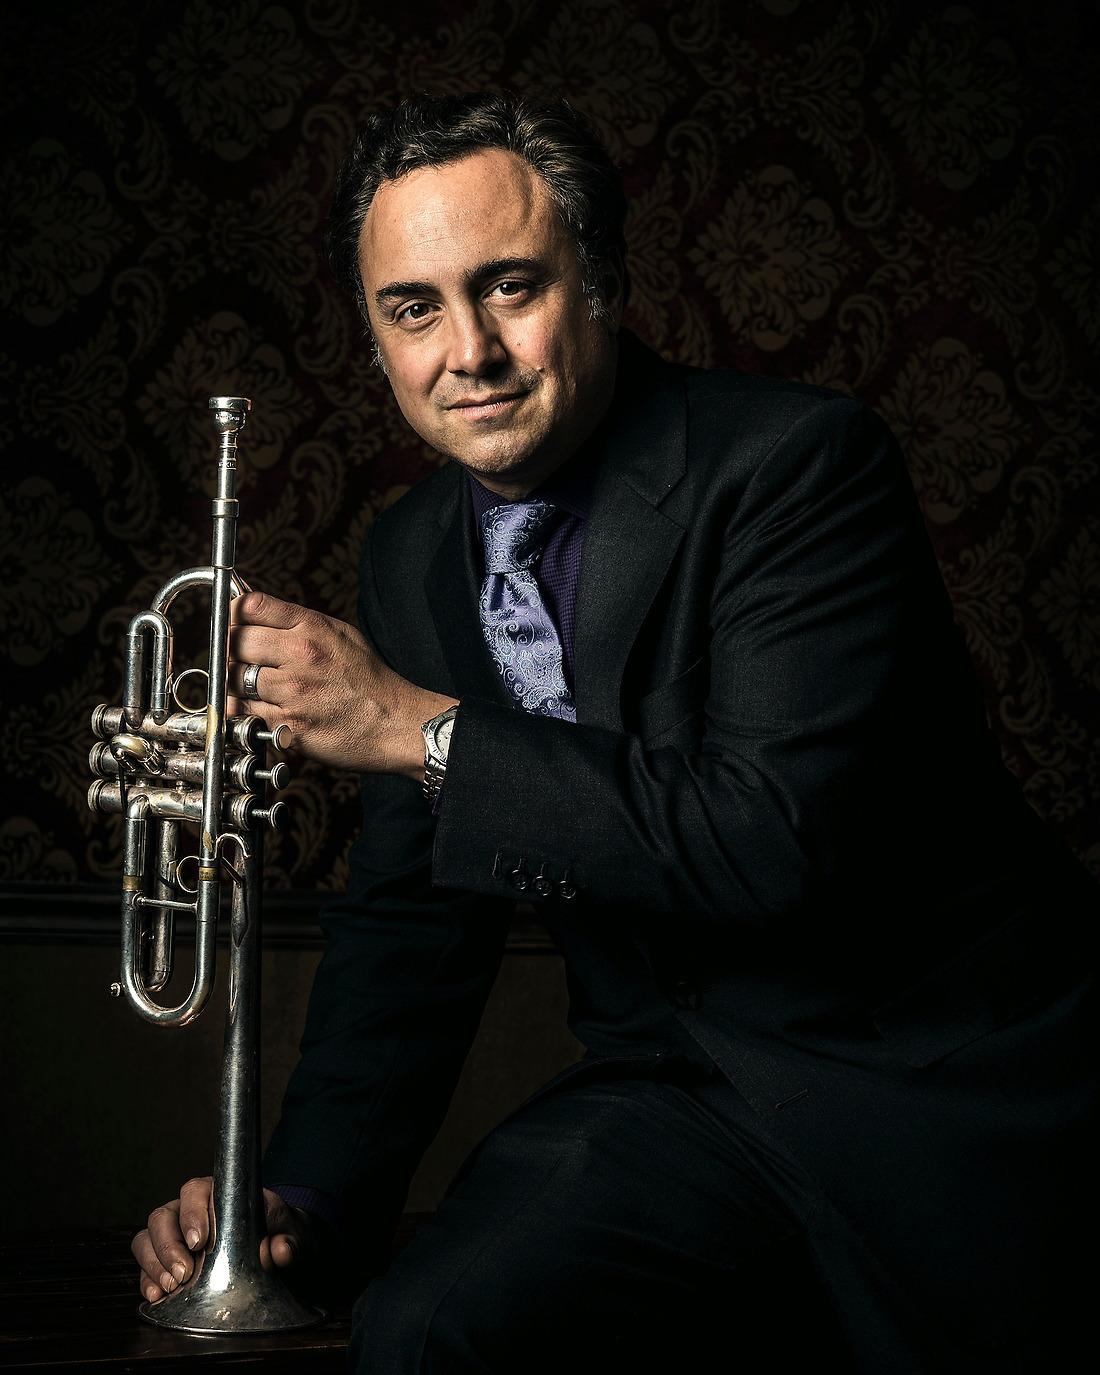 Anthony DiLorenzo National Trumpet Freelancer and Composer. — © Jeremy Lock/